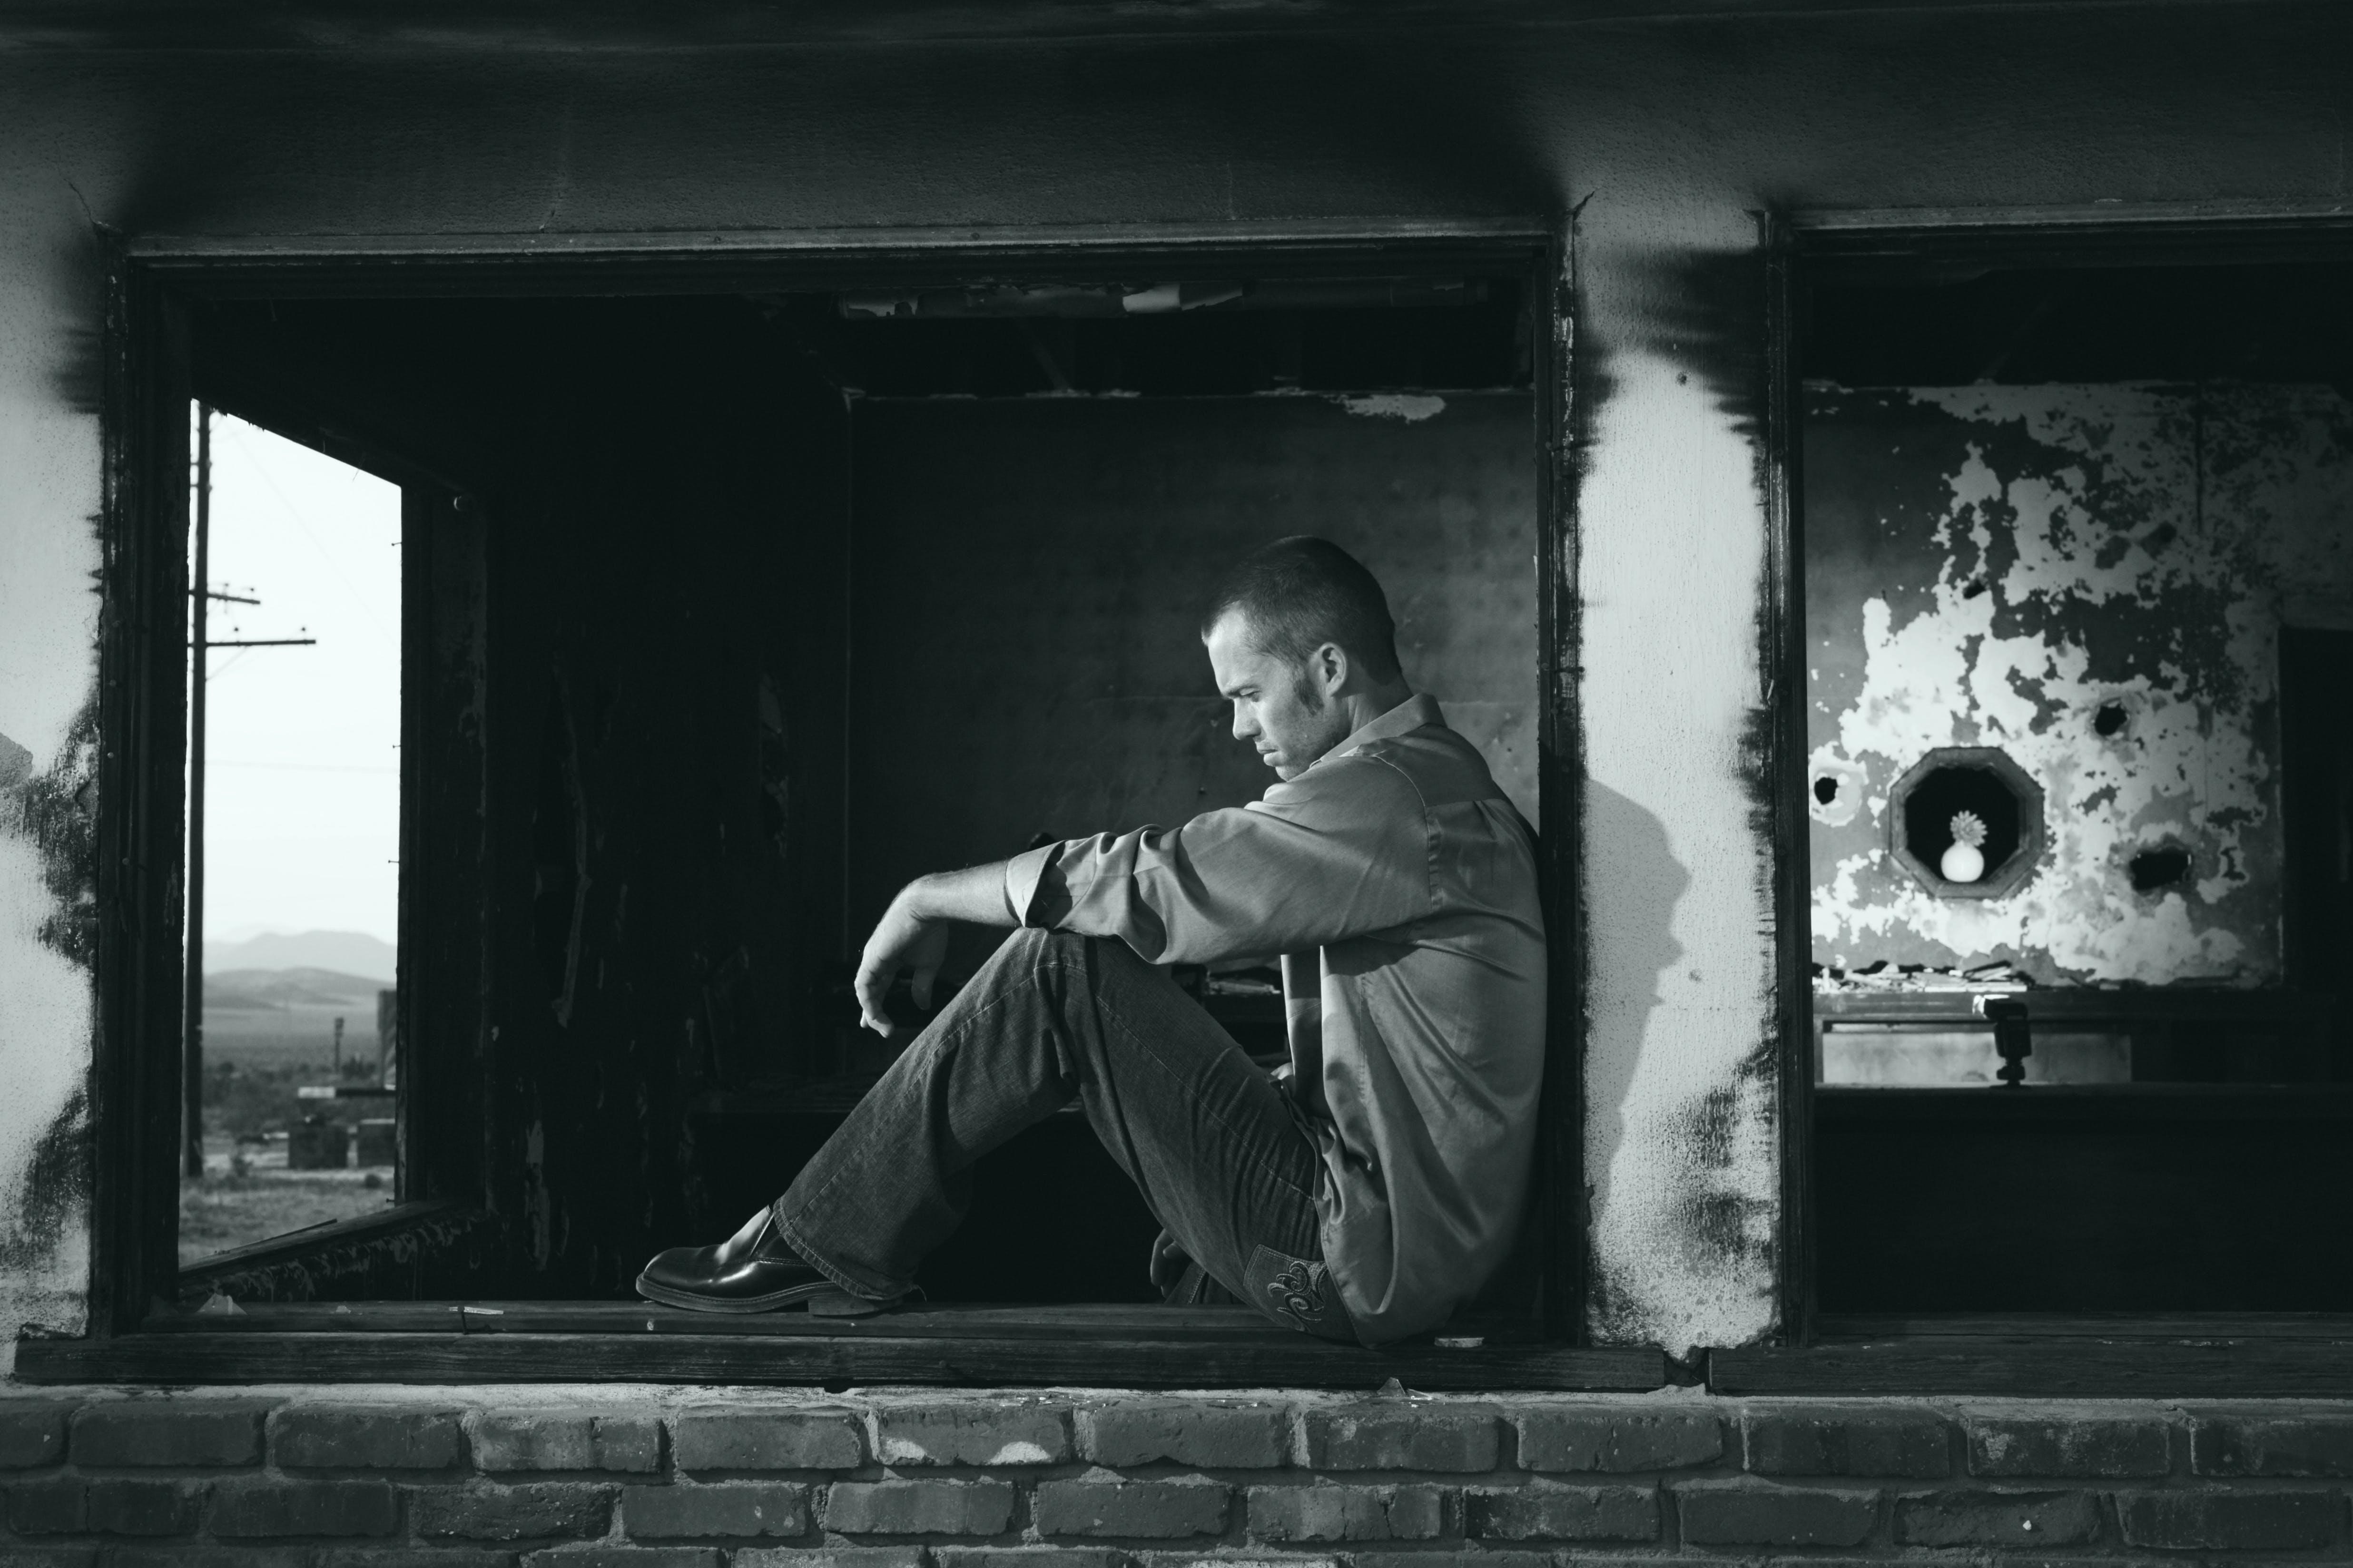 Grayscale Photo of Man Sitting